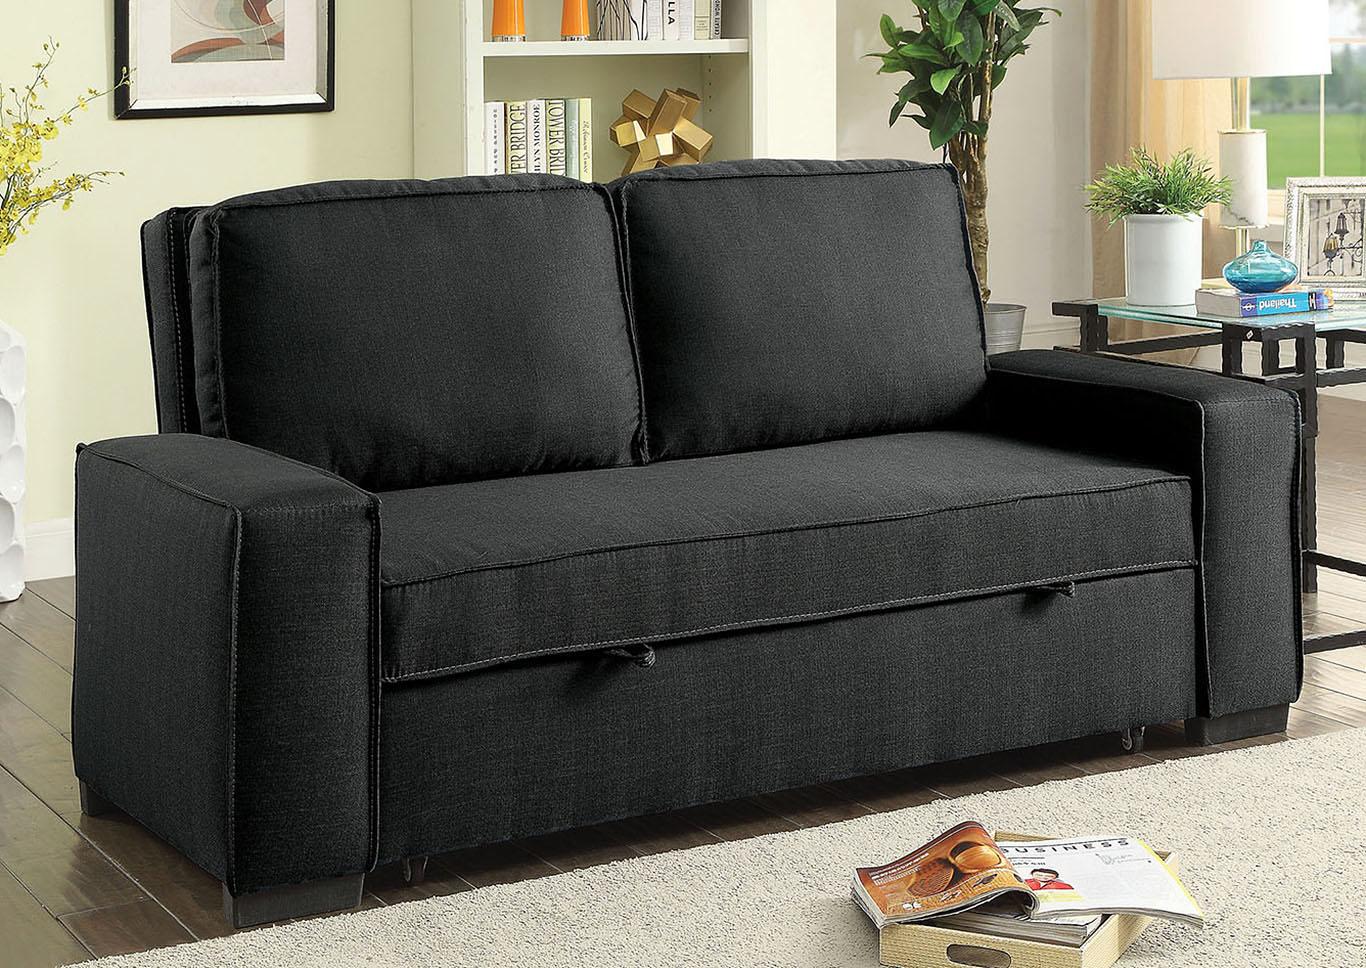 Balbriggan warm gray futon sofafurniture of america